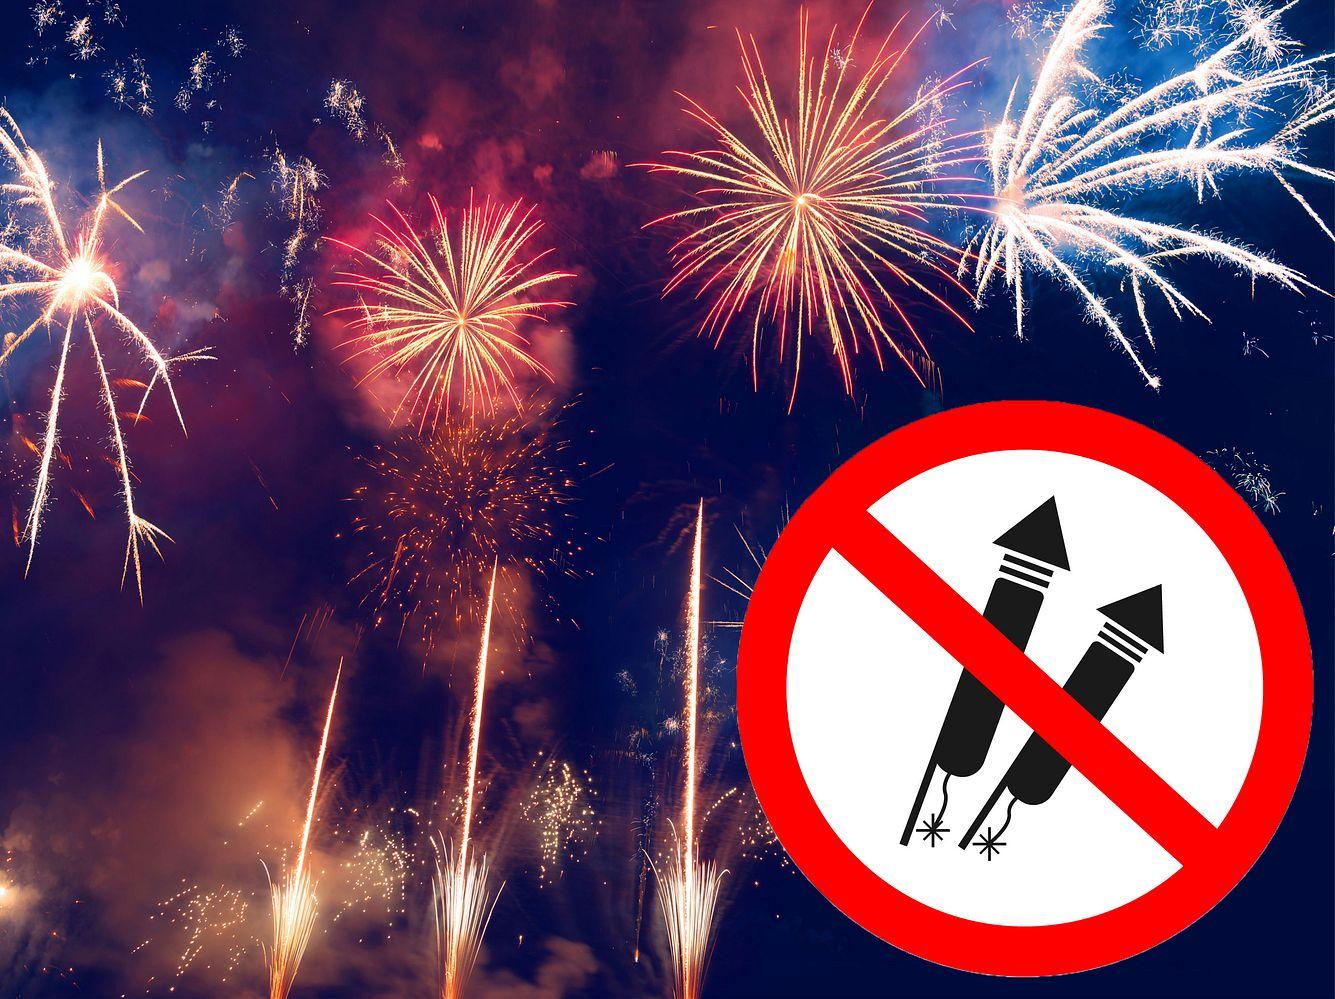 Silvester 2020: Welche Regelungen wo gelten.